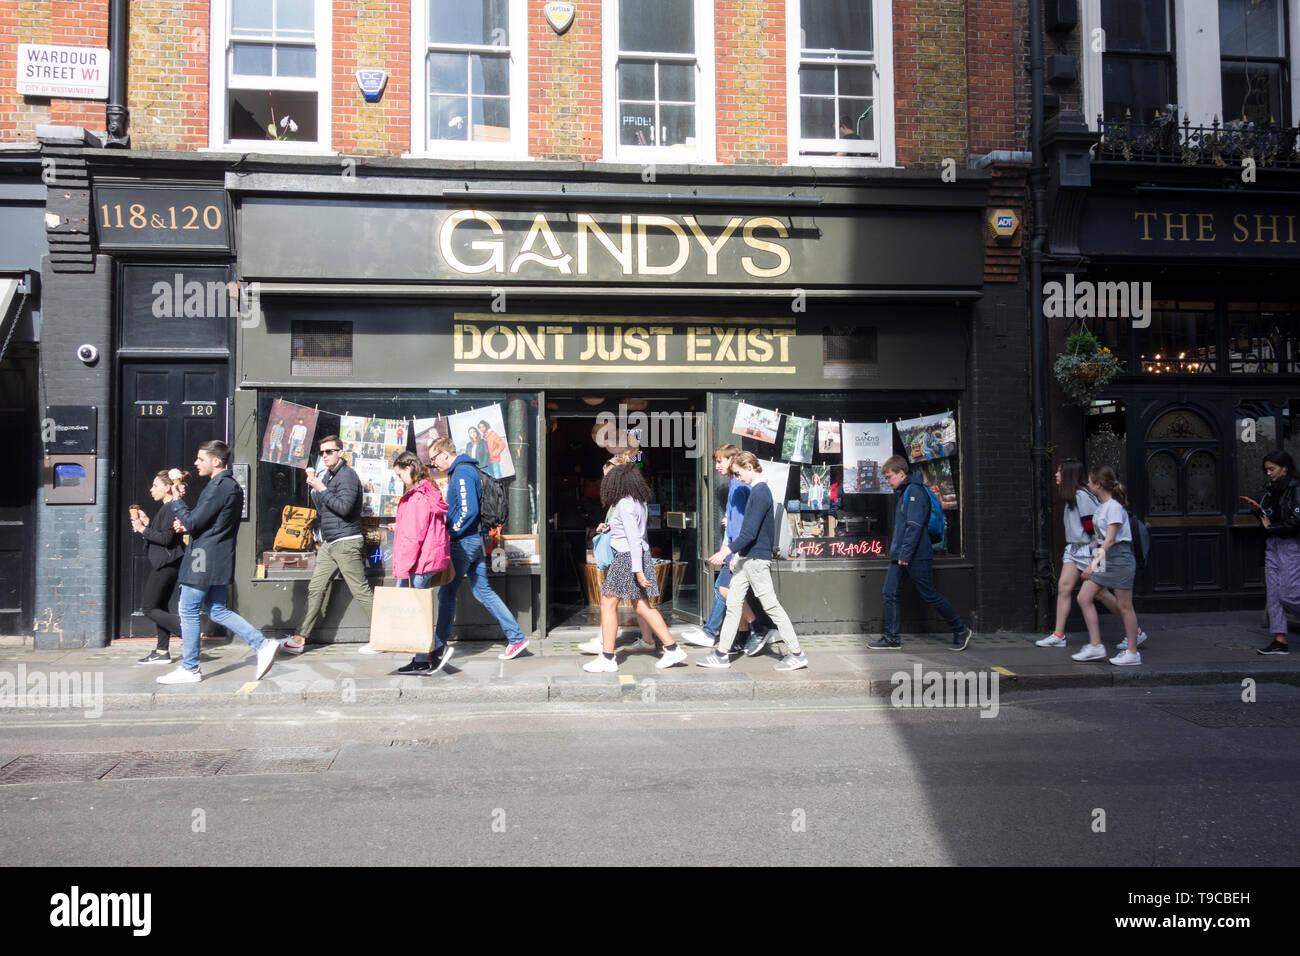 Gandy's shop front, Wardour Street, London, UK - Stock Image